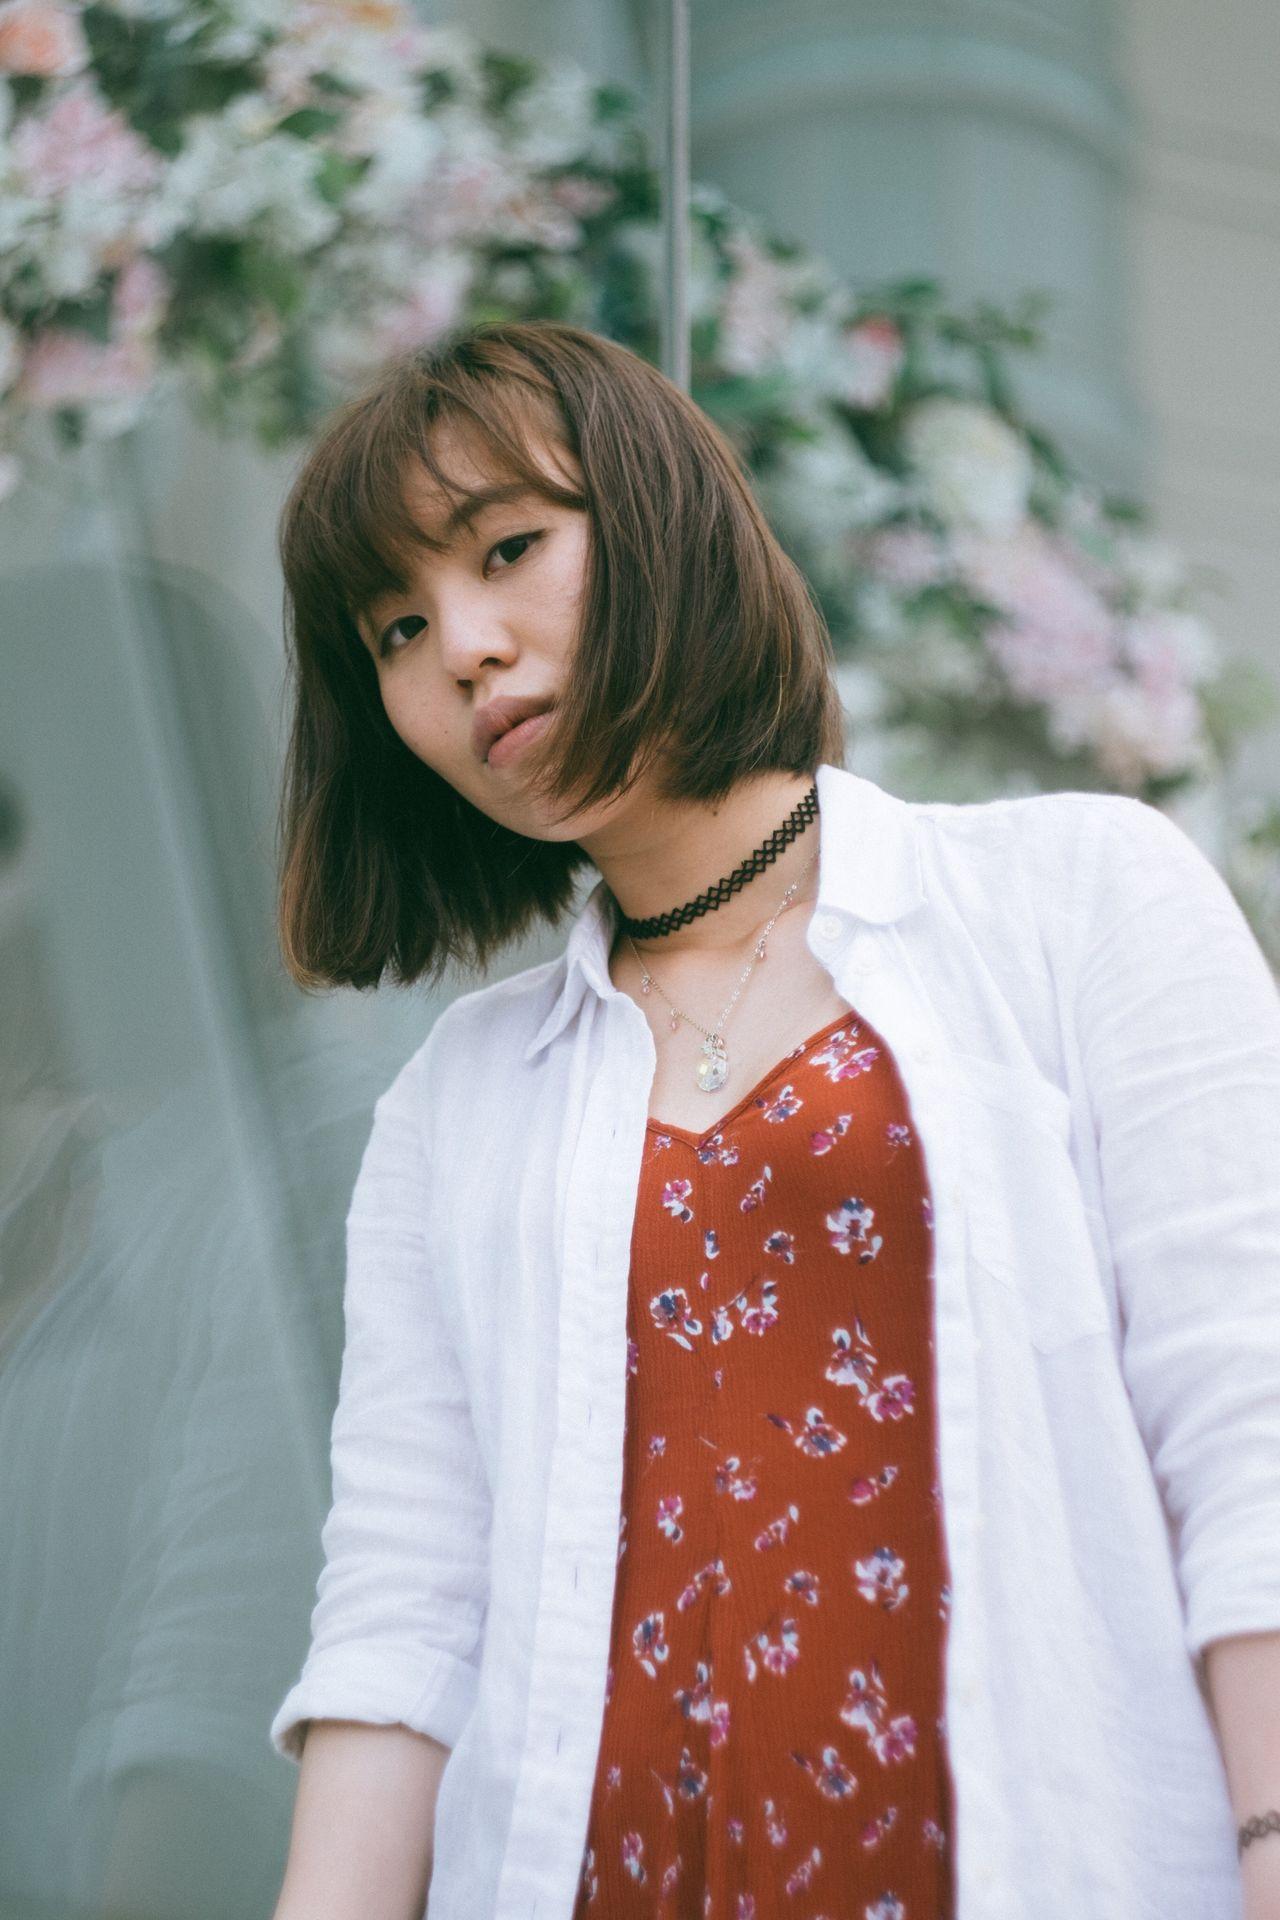 Explore Hk Portrait Of A Woman Girlfriend FUJIFILM X-T1 Beautiful Woman